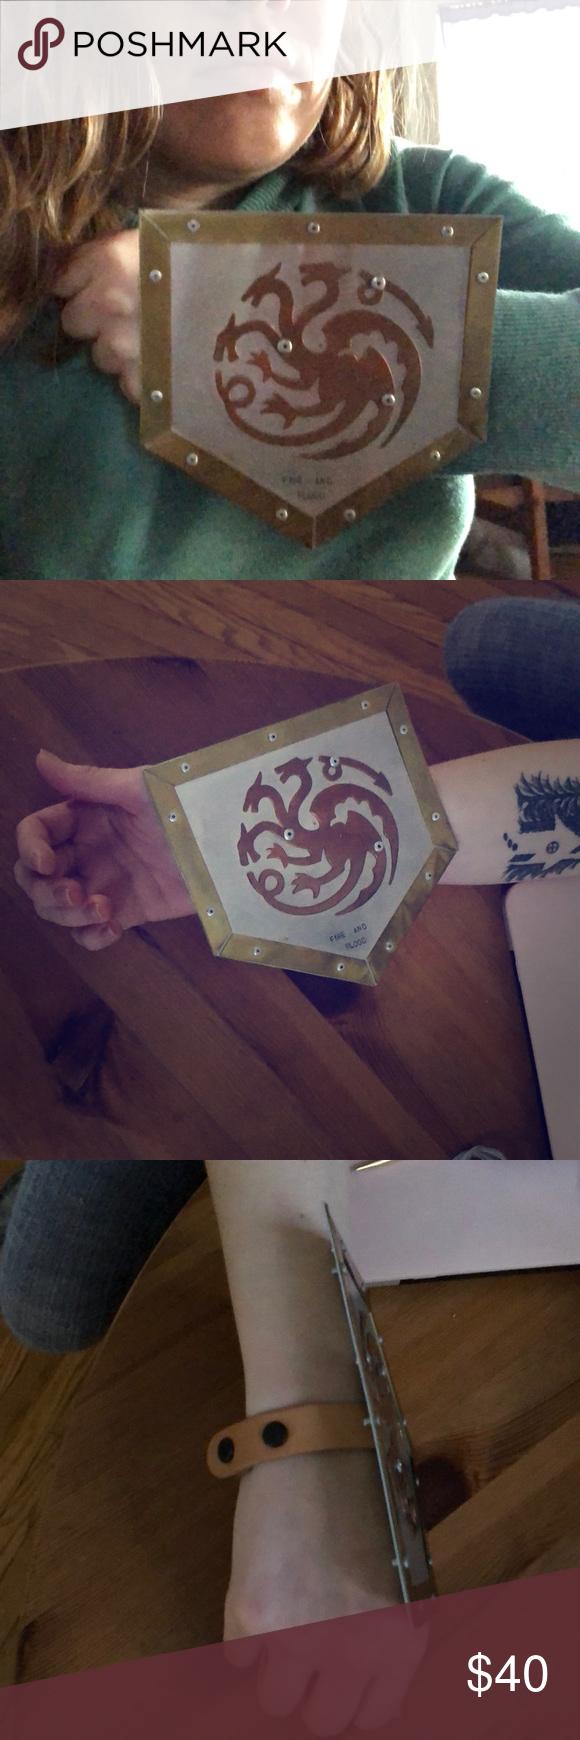 House Targaryen Of Dragonstone Bracelet And Shield Lovely Handmade Leather Copper Br With The Banner